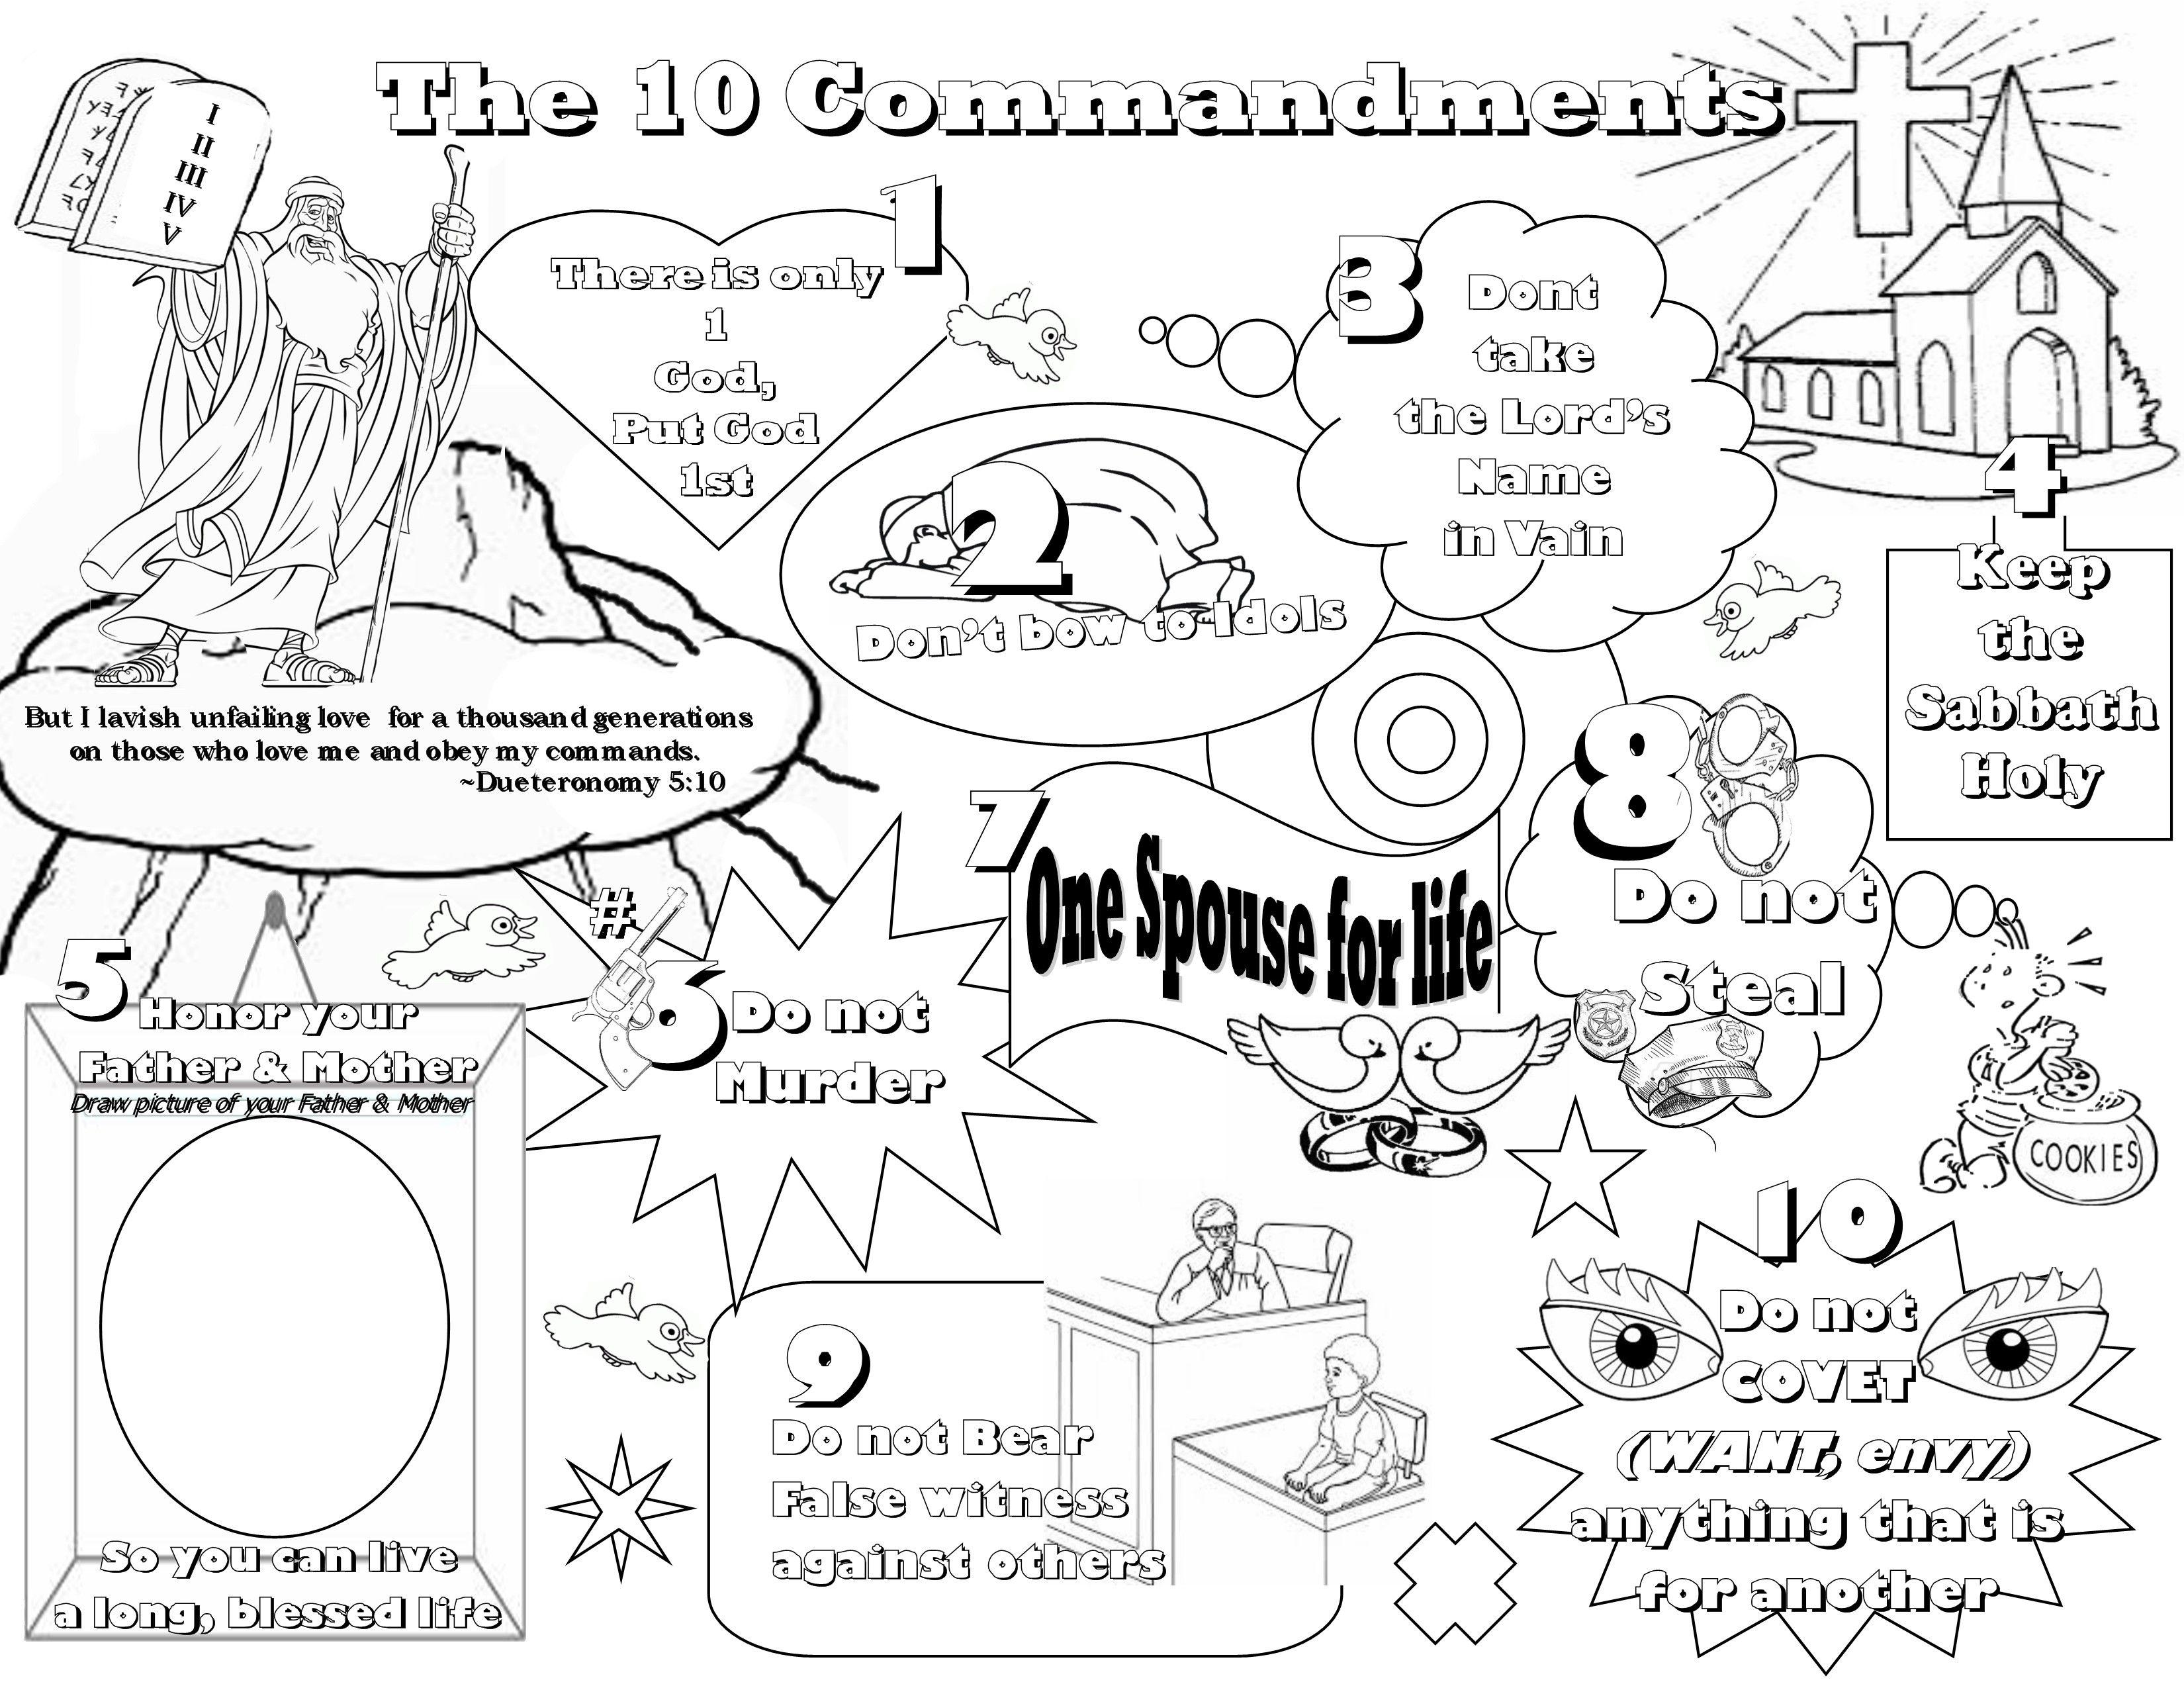 Exquisite Free Printable Ten Commandments Coloring Pages Do Not - Free Printable Ten Commandments Coloring Pages